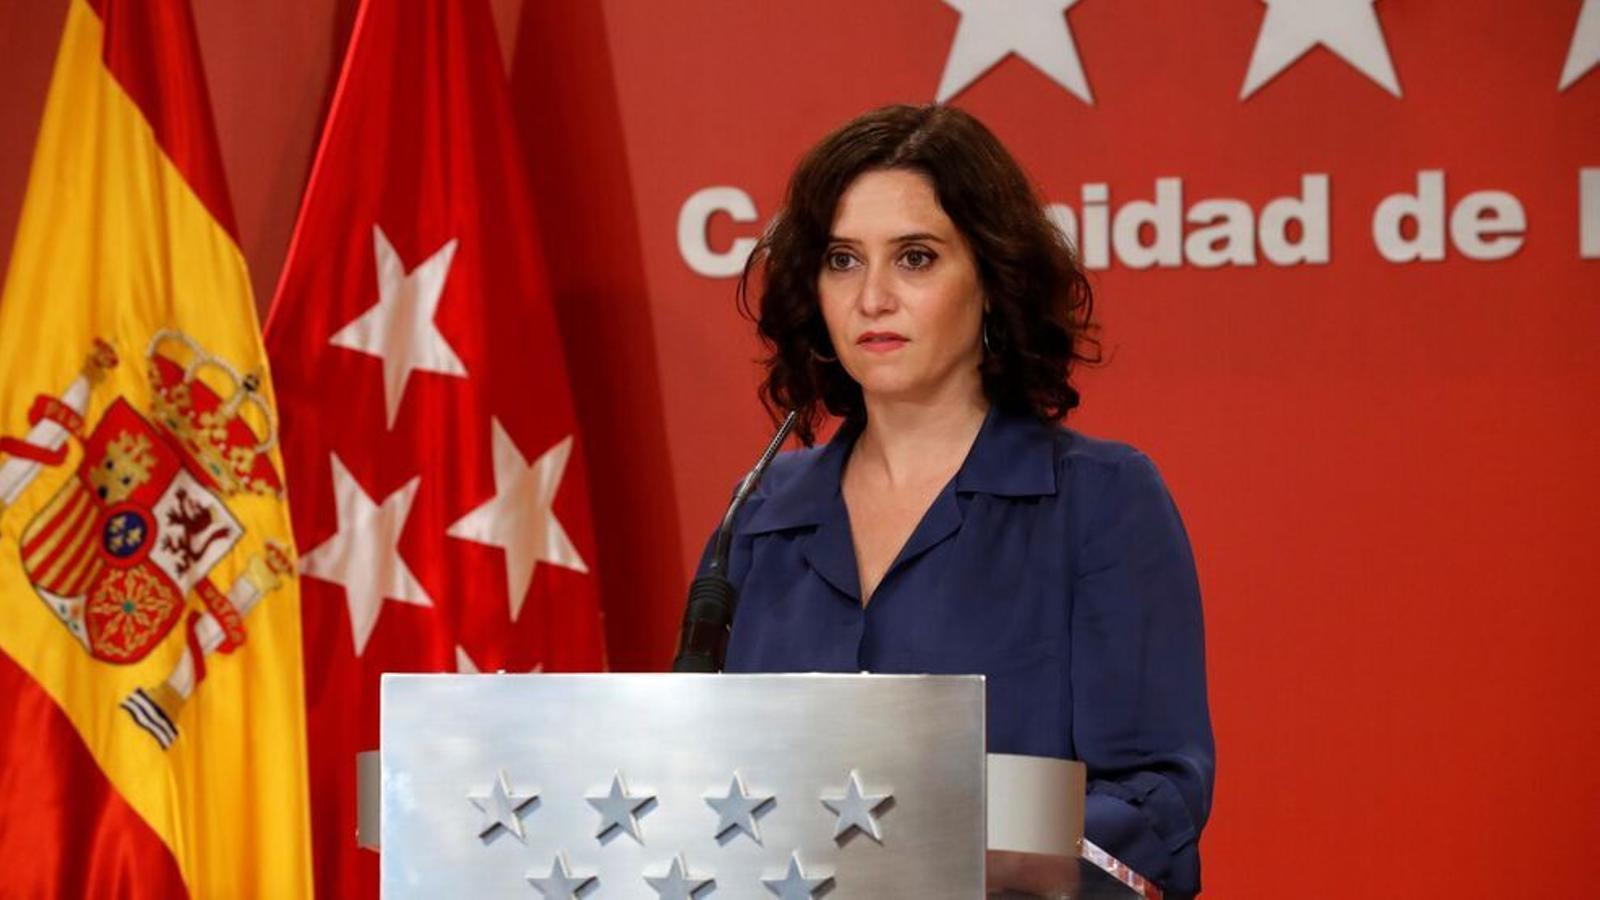 La presidenta de la Comunitat de Madrid, Isabel Díaz Ayuso, en una imatge d'arxiu.